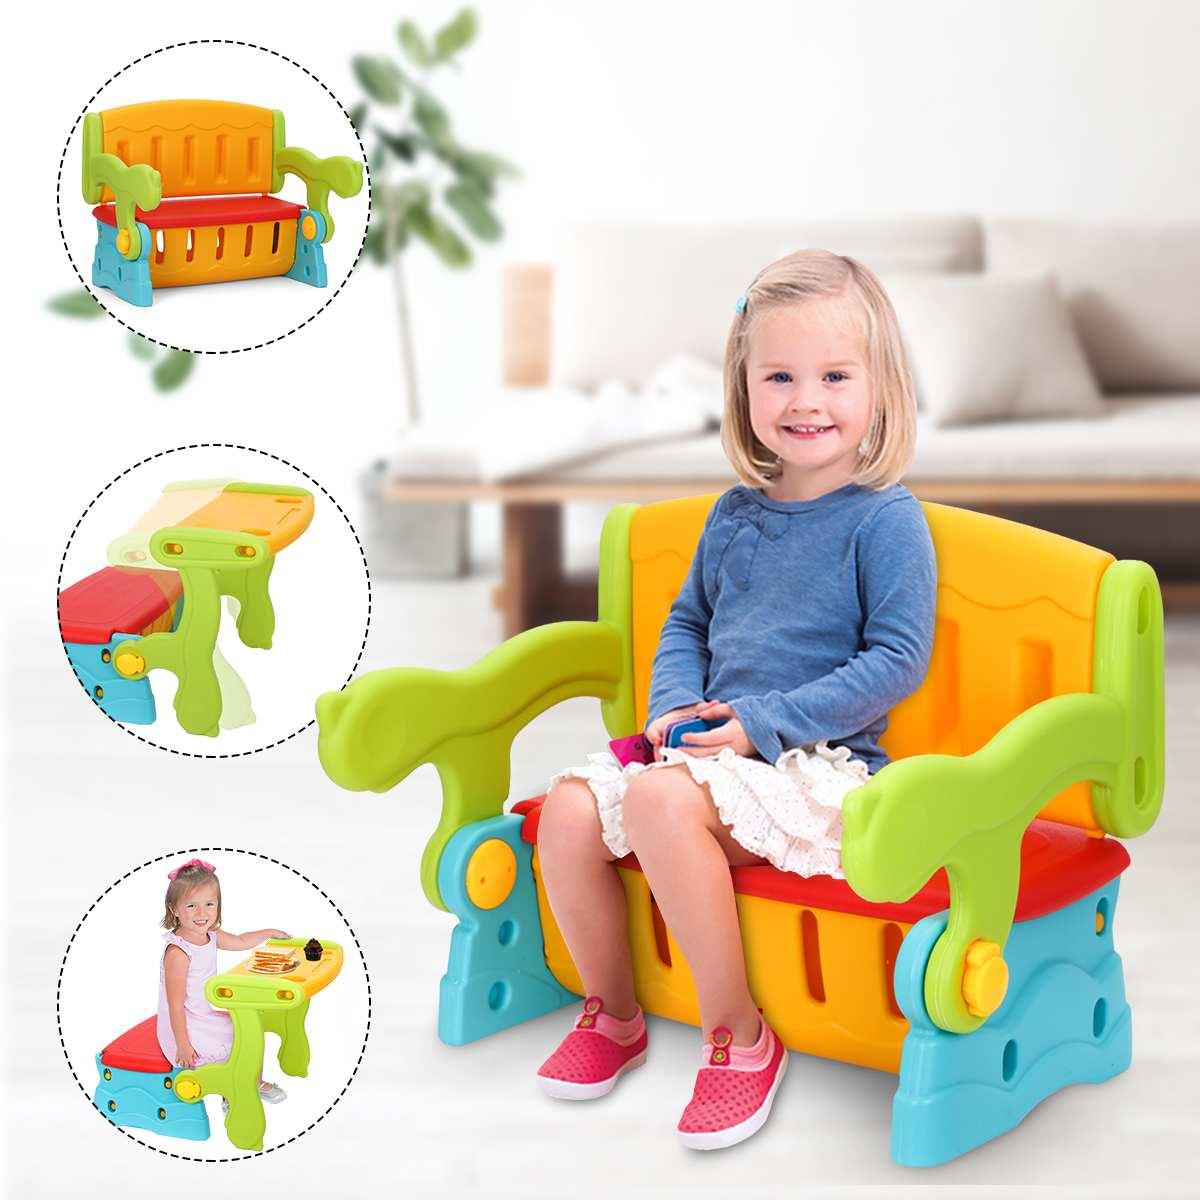 3-in-1 Multifunction Chair Kids Switching Playing Study Desk Toddler Seat Storage Box Stool Home School Children Furniture Set